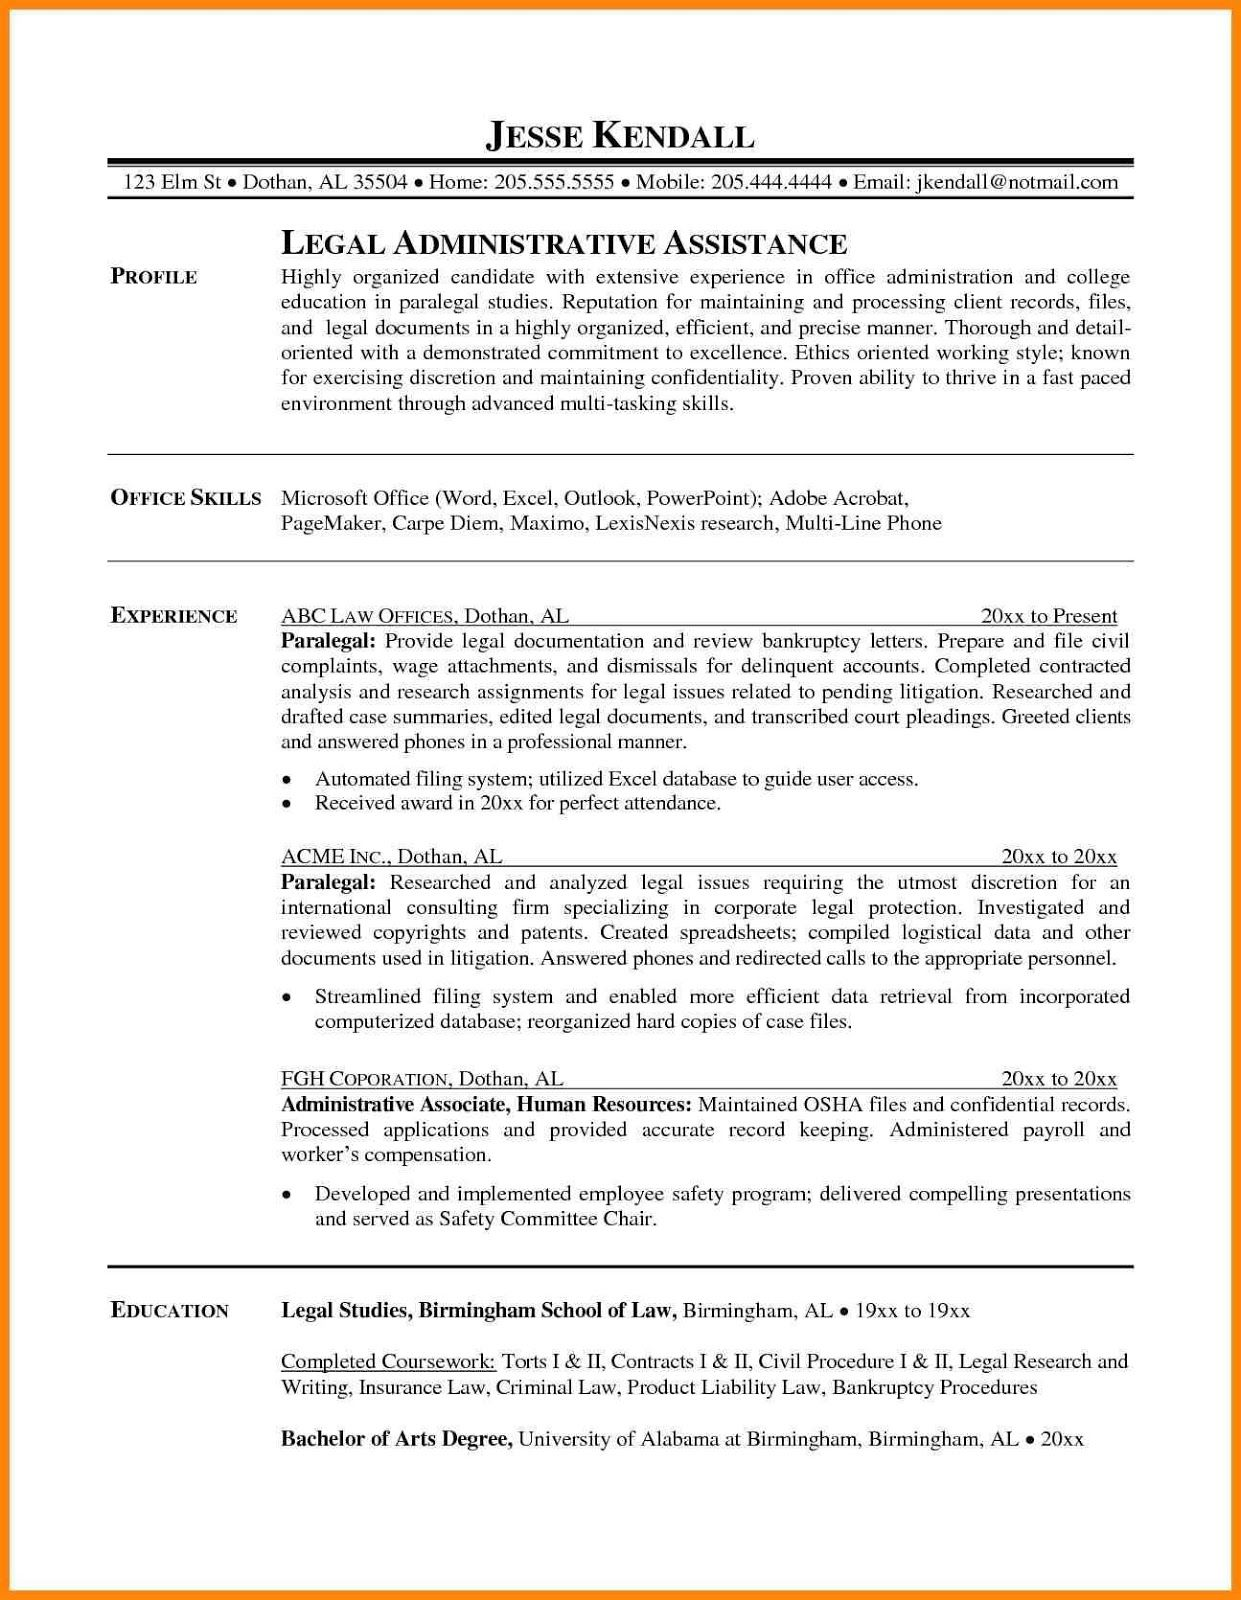 Paralegal resume sample 2019 paralegal resume examples